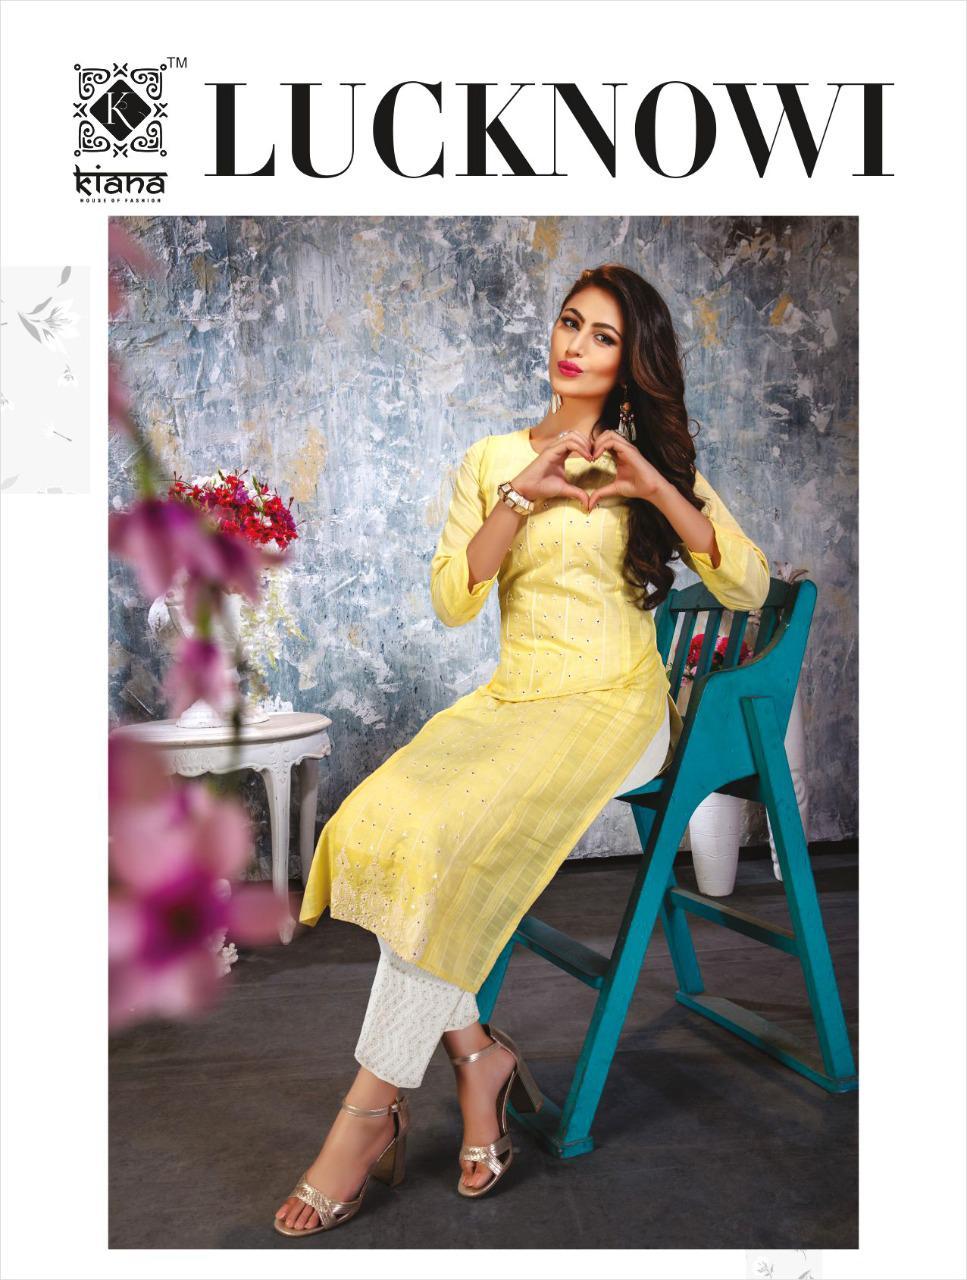 Kiana Lucknowi Kurti with Pant Wholesale Catalog 6 Pcs 1 - Kiana Lucknowi Kurti with Pant Wholesale Catalog 6 Pcs